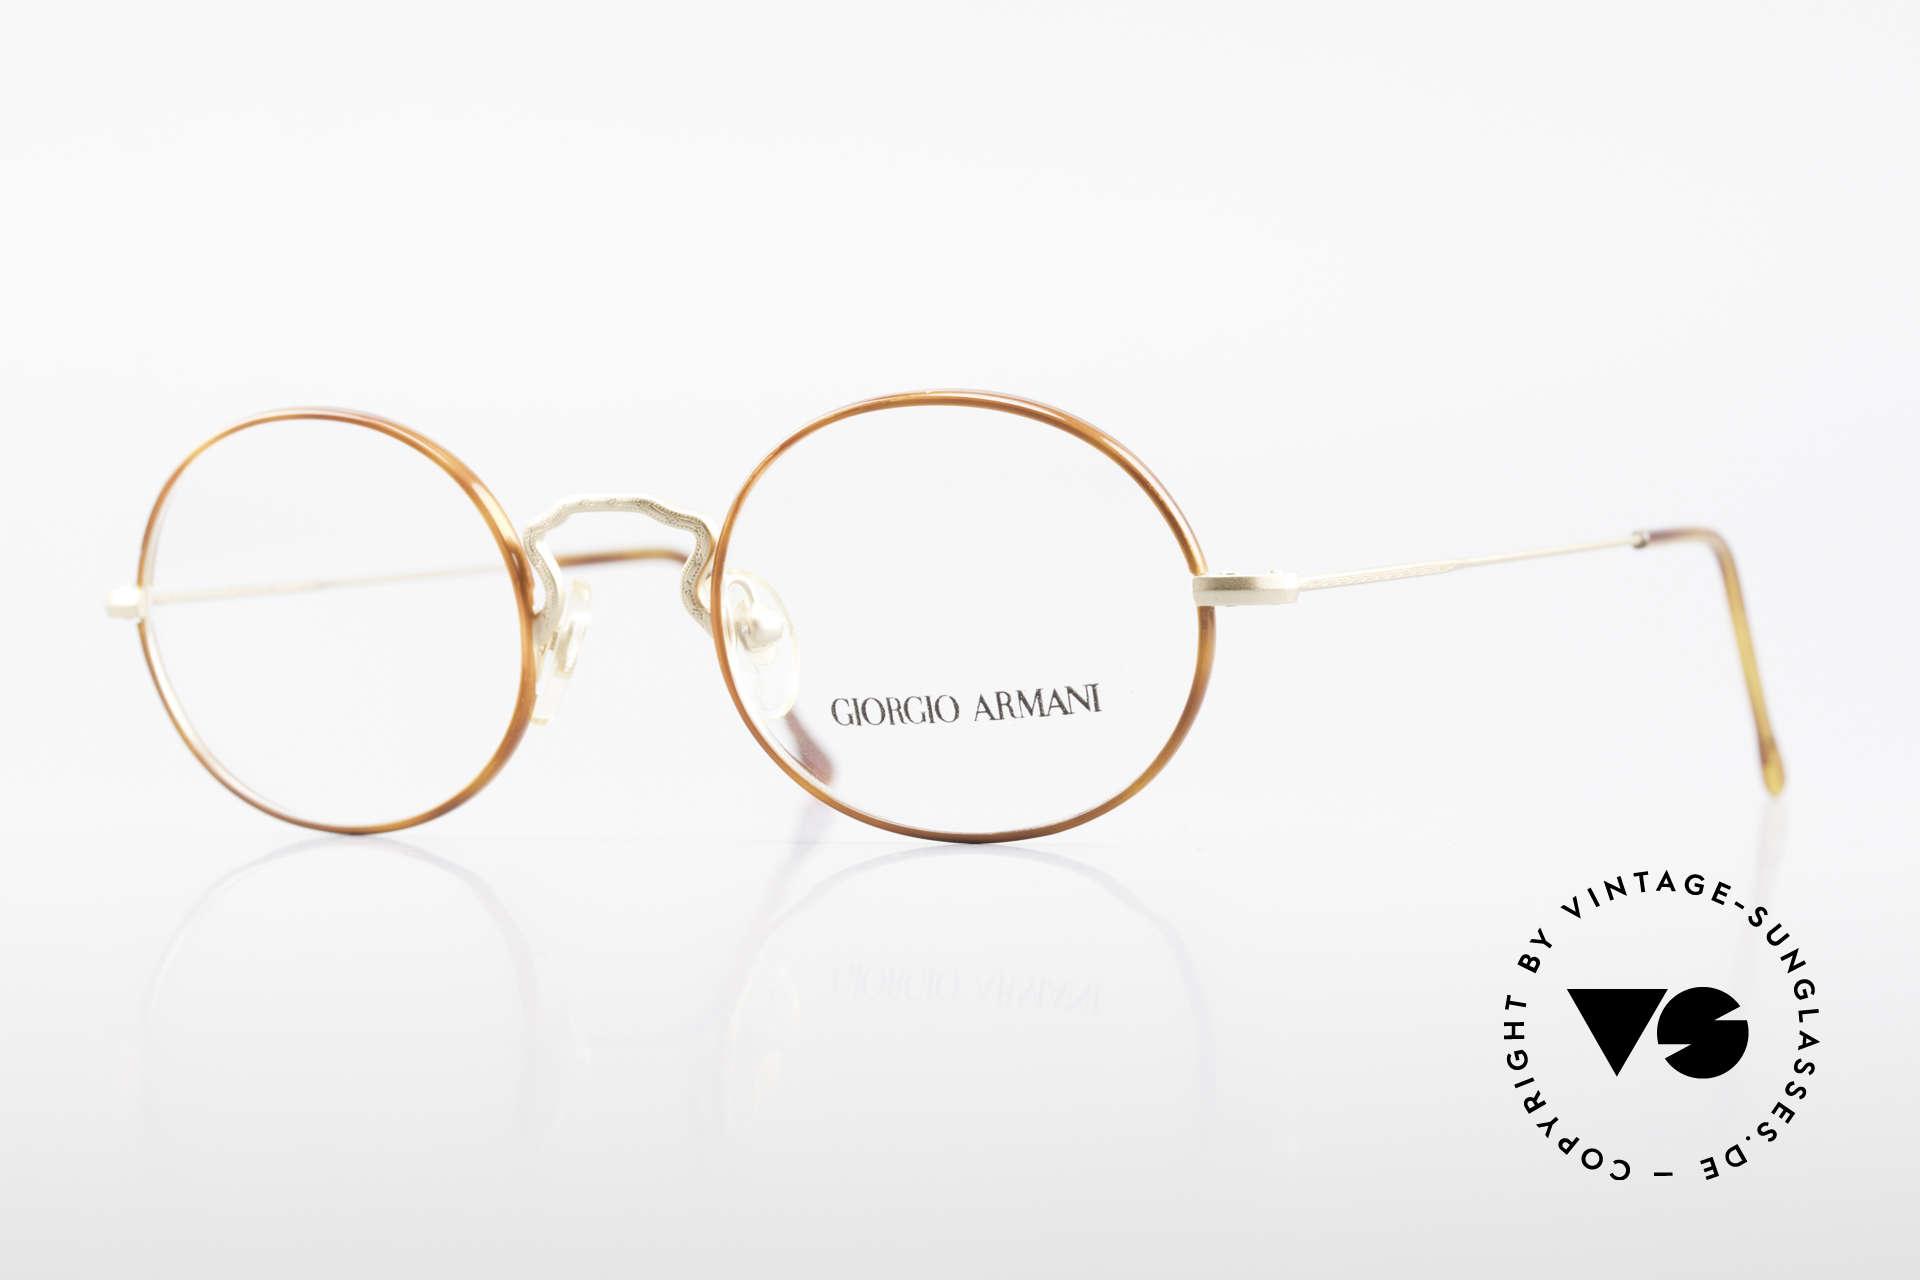 Giorgio Armani 247 90's Oval Eyeglasses No Retro, vintage designer eyeglasses by Giorgio Armani, Italy, Made for Men and Women